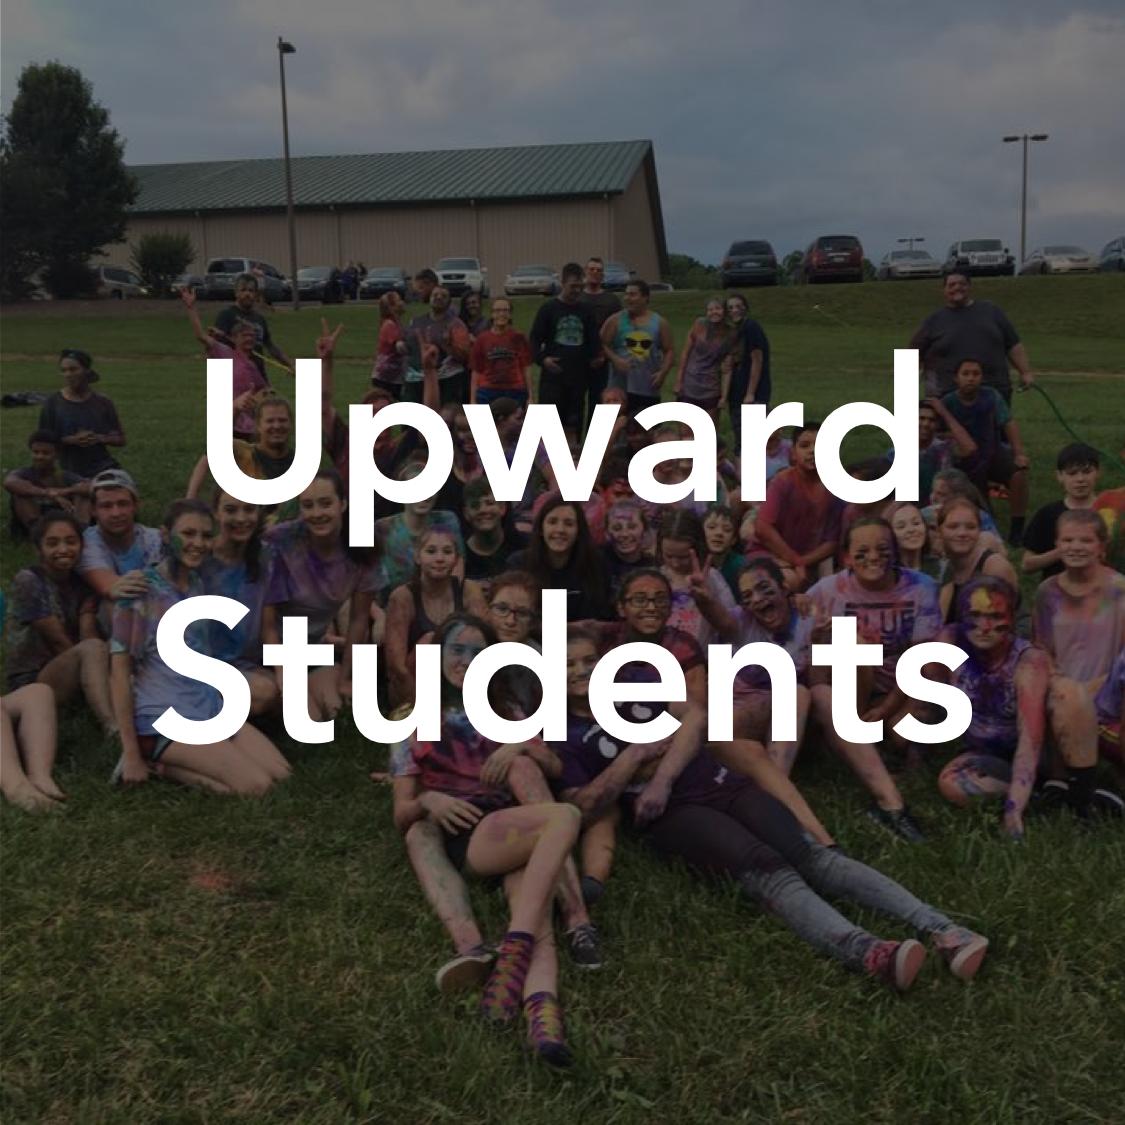 Upward Students